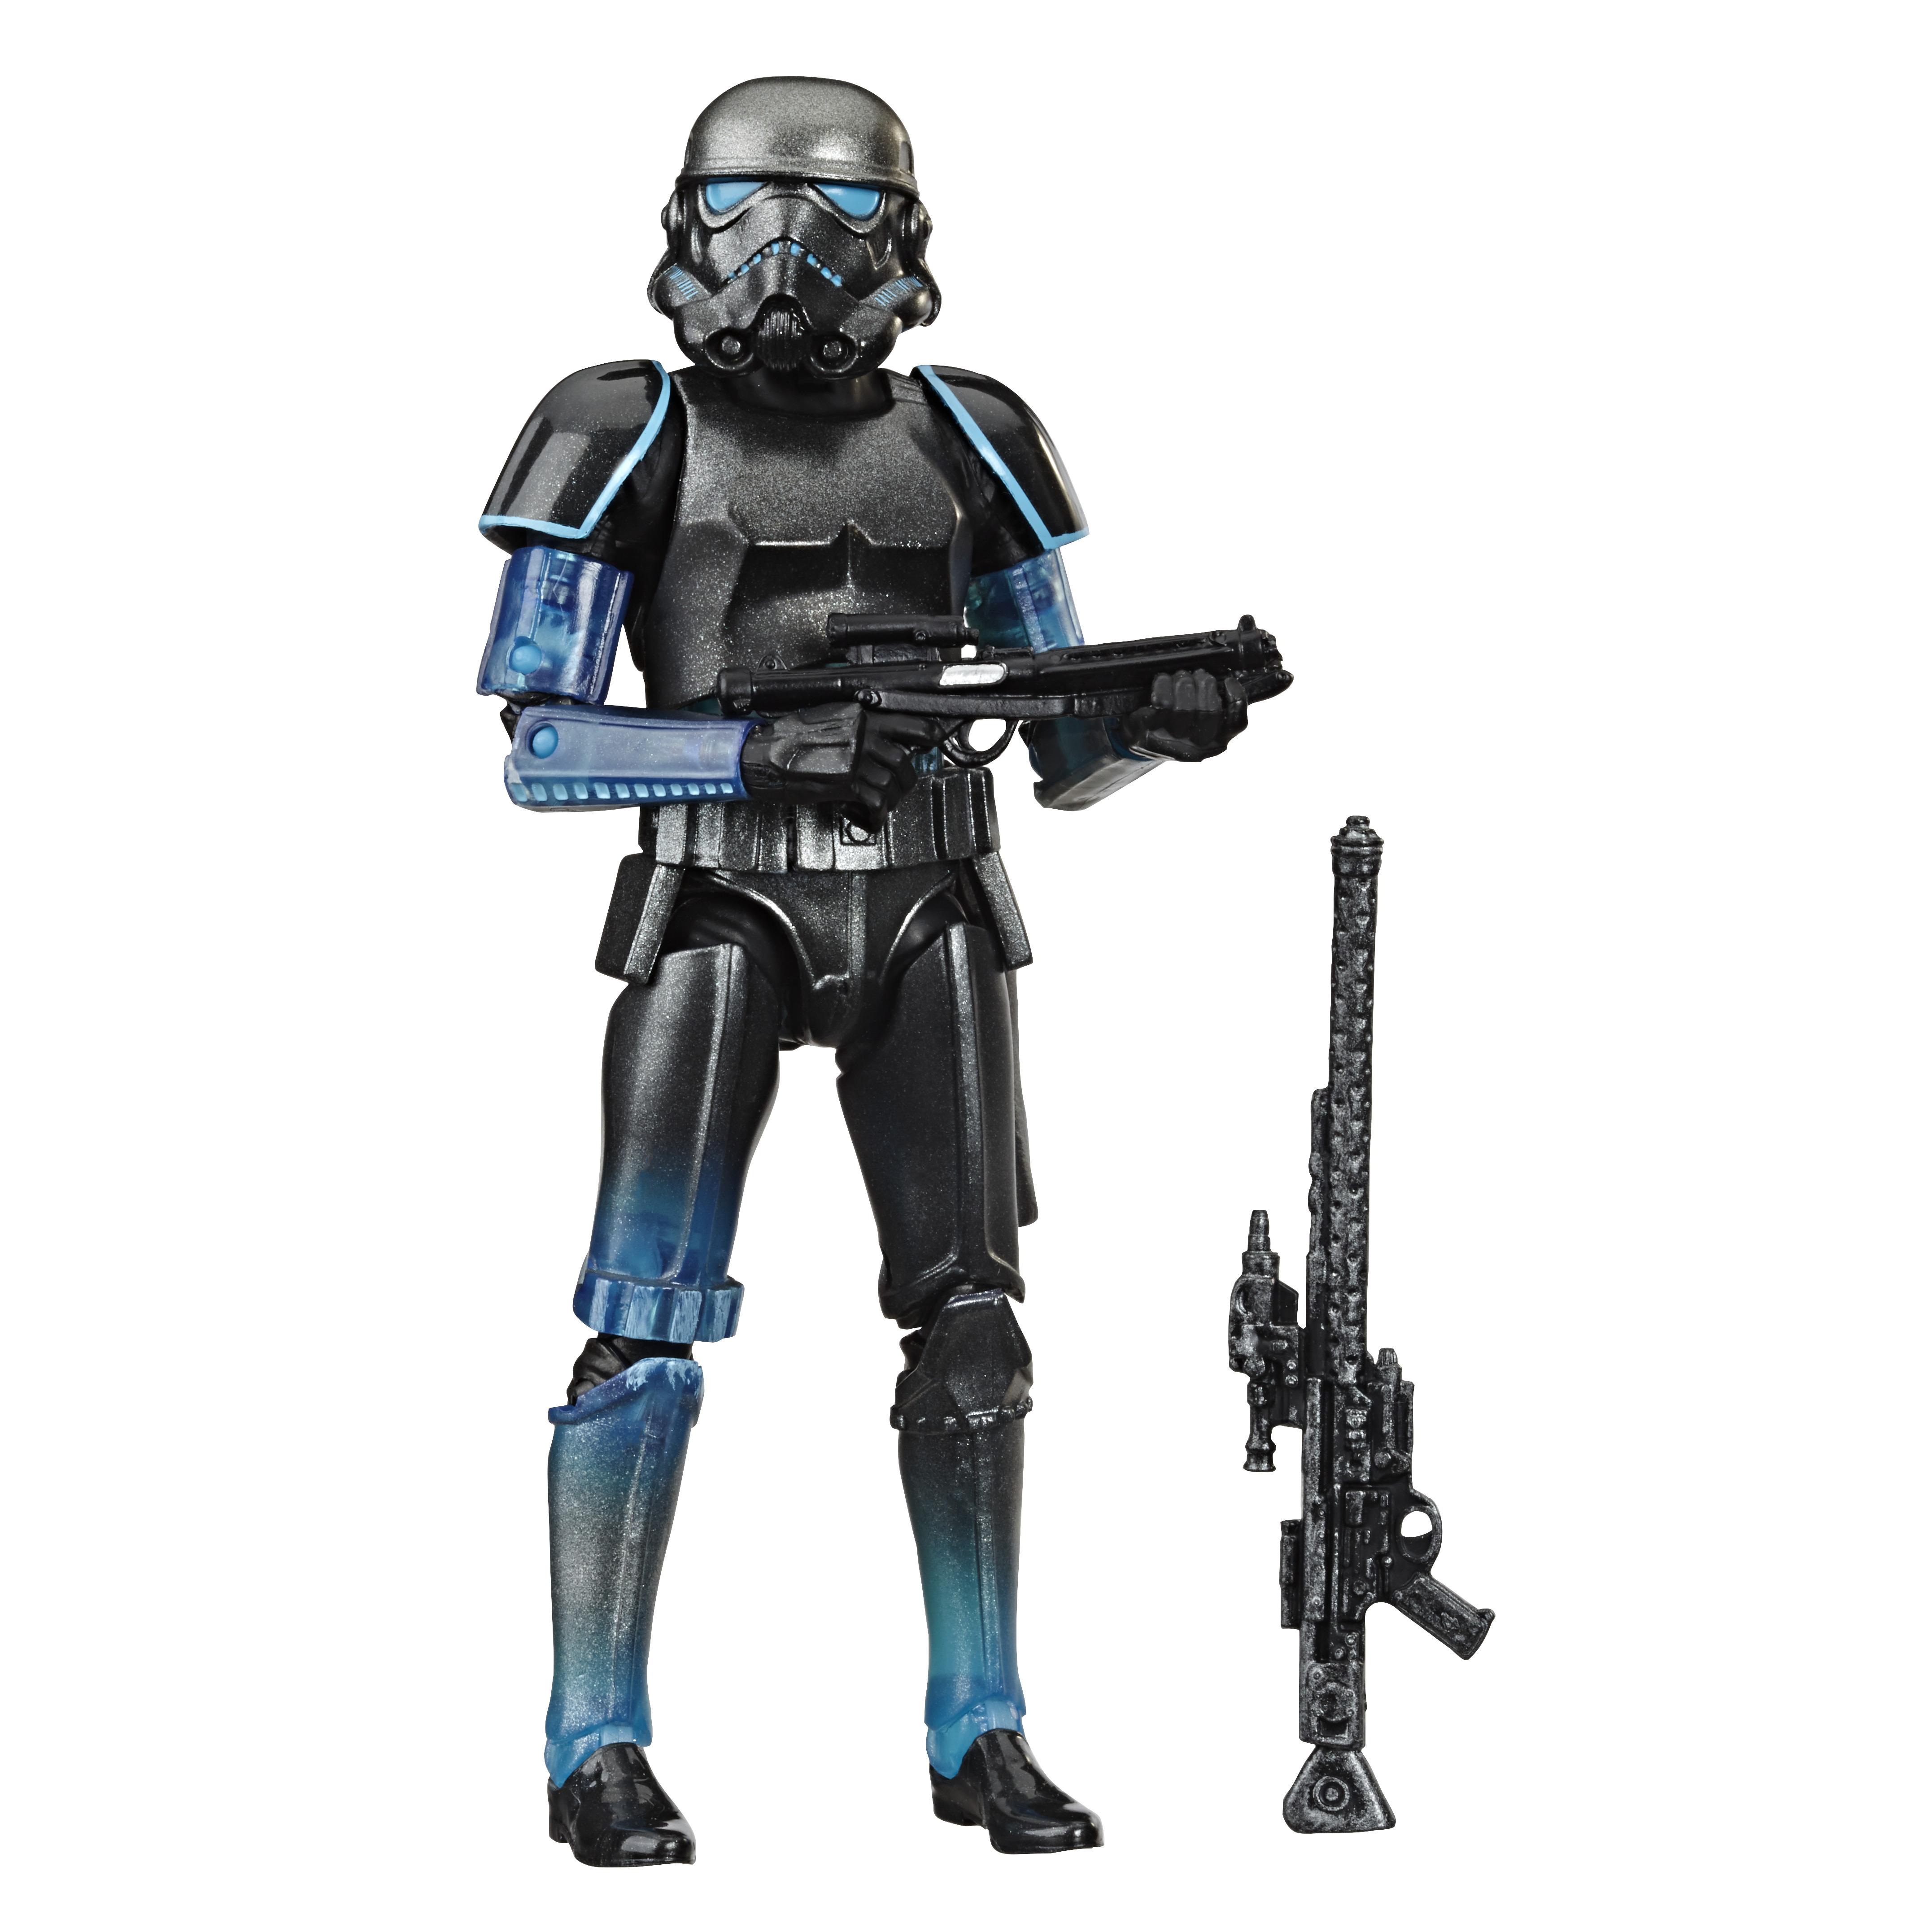 "Star Wars The Black Series Shadow Stormtrooper Action Figure 6"" Reihe E9622 5010993689620"